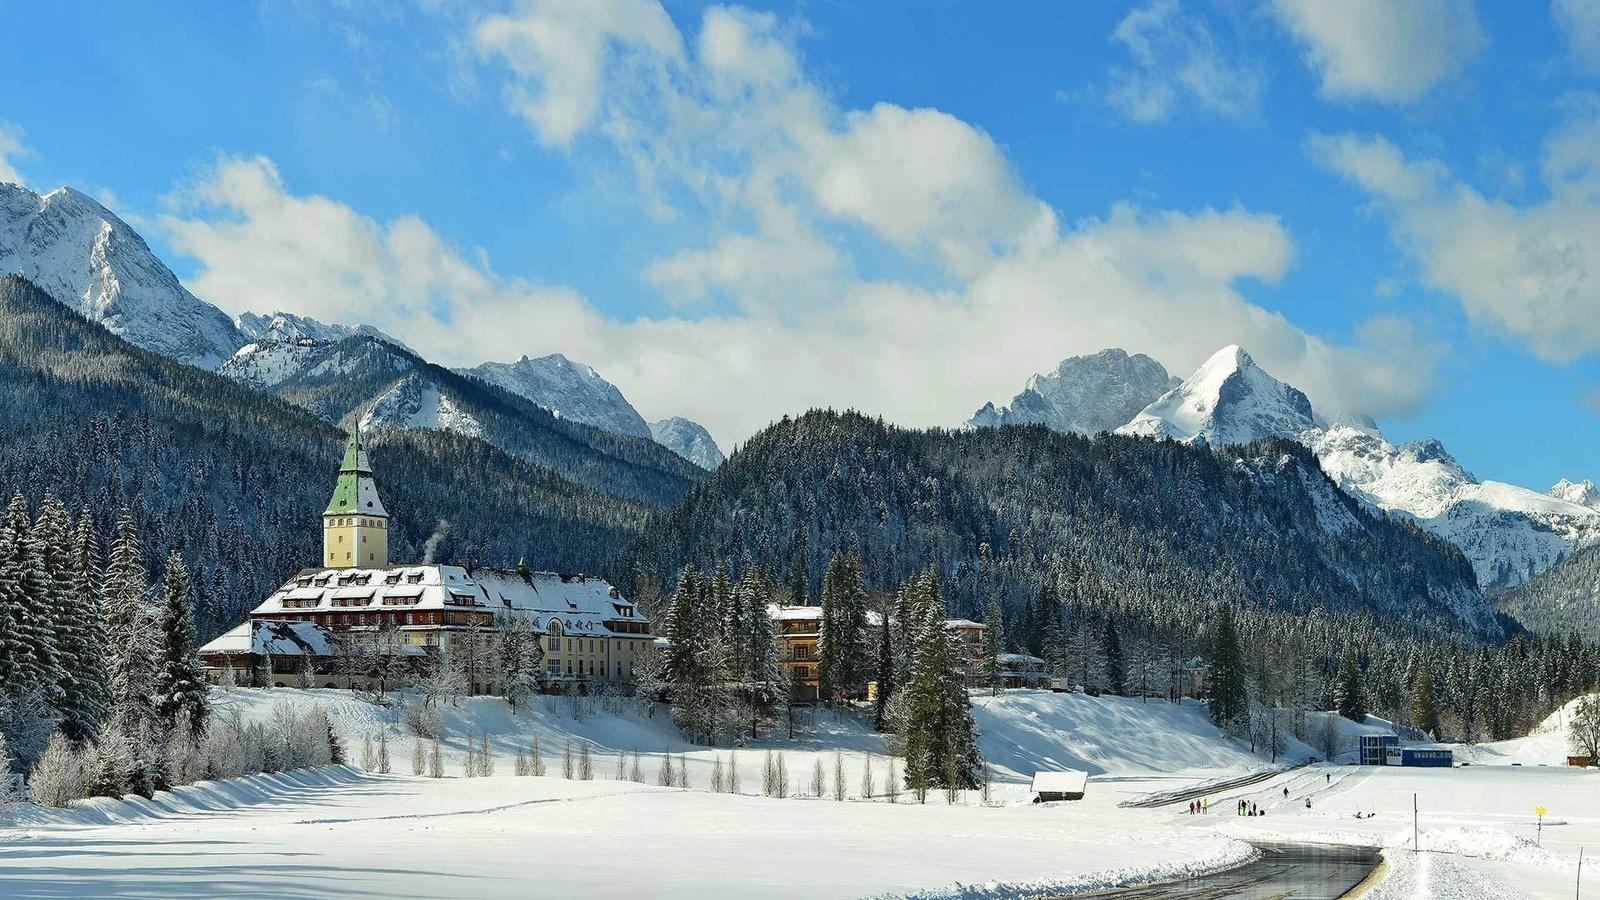 замок эльмау, крюн, гармиш-партенкирхен, бавария, германия, горы, деревья, зима, снег